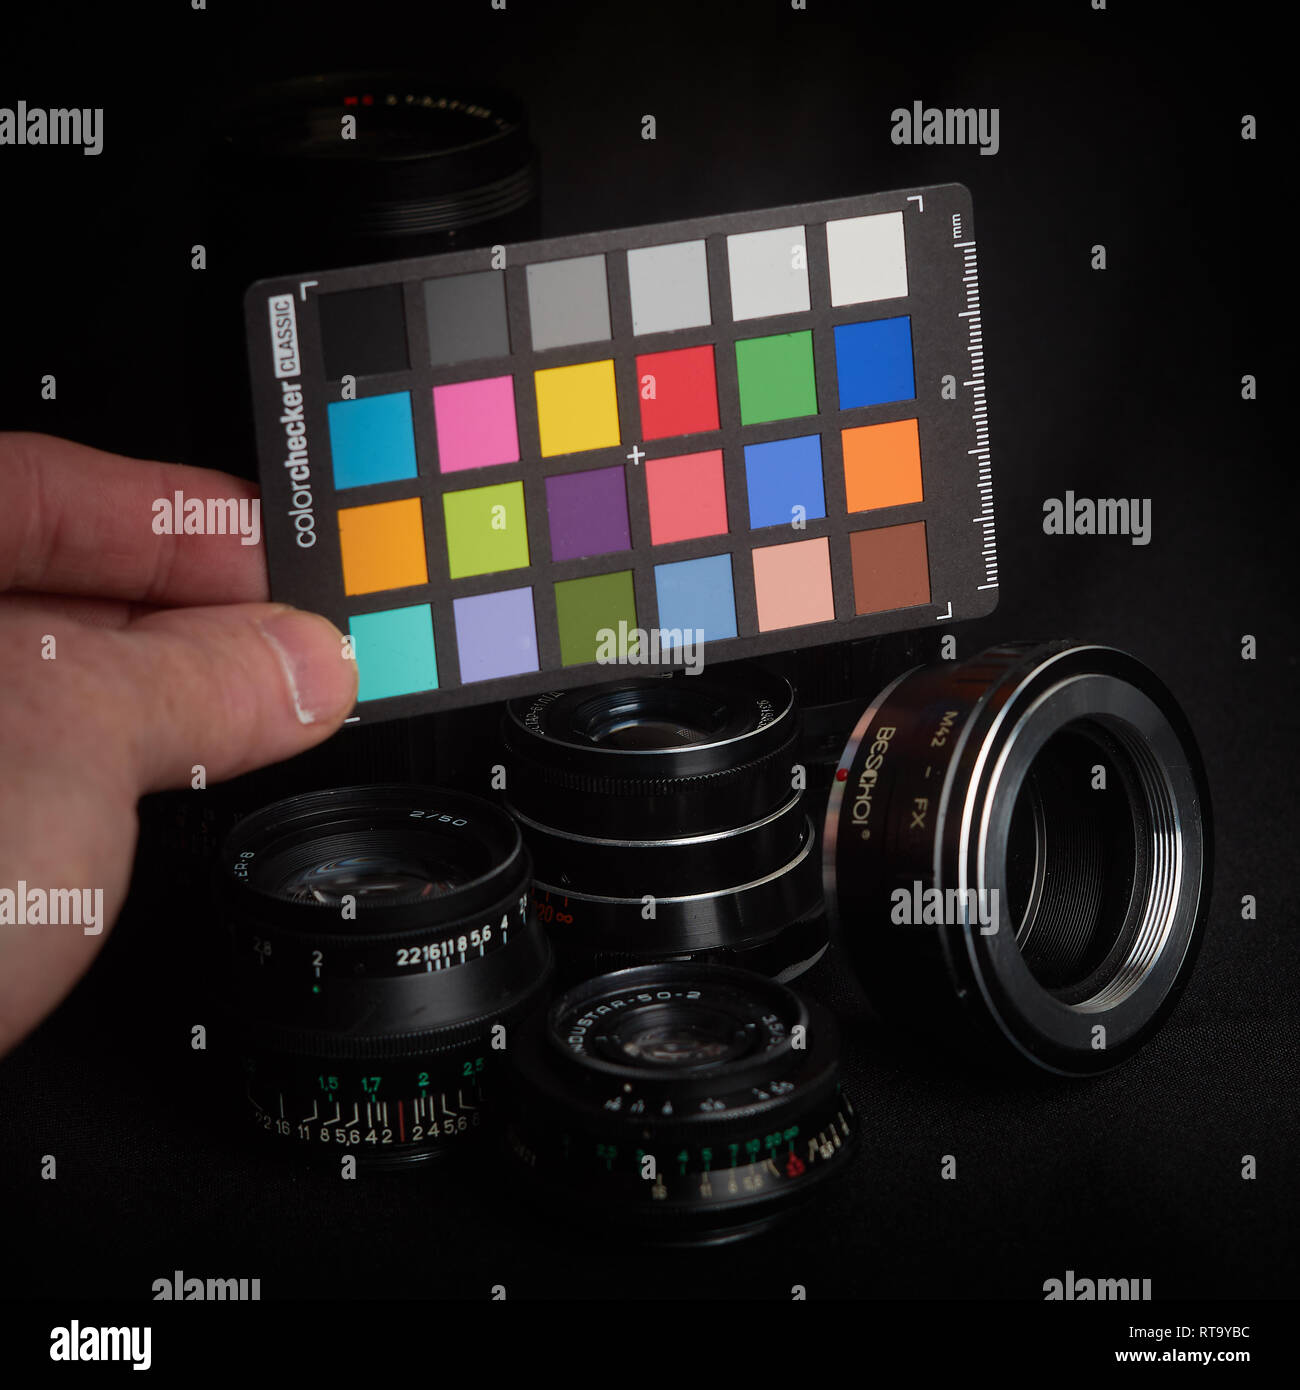 Color Calibration Stock Photos & Color Calibration Stock Images - Alamy